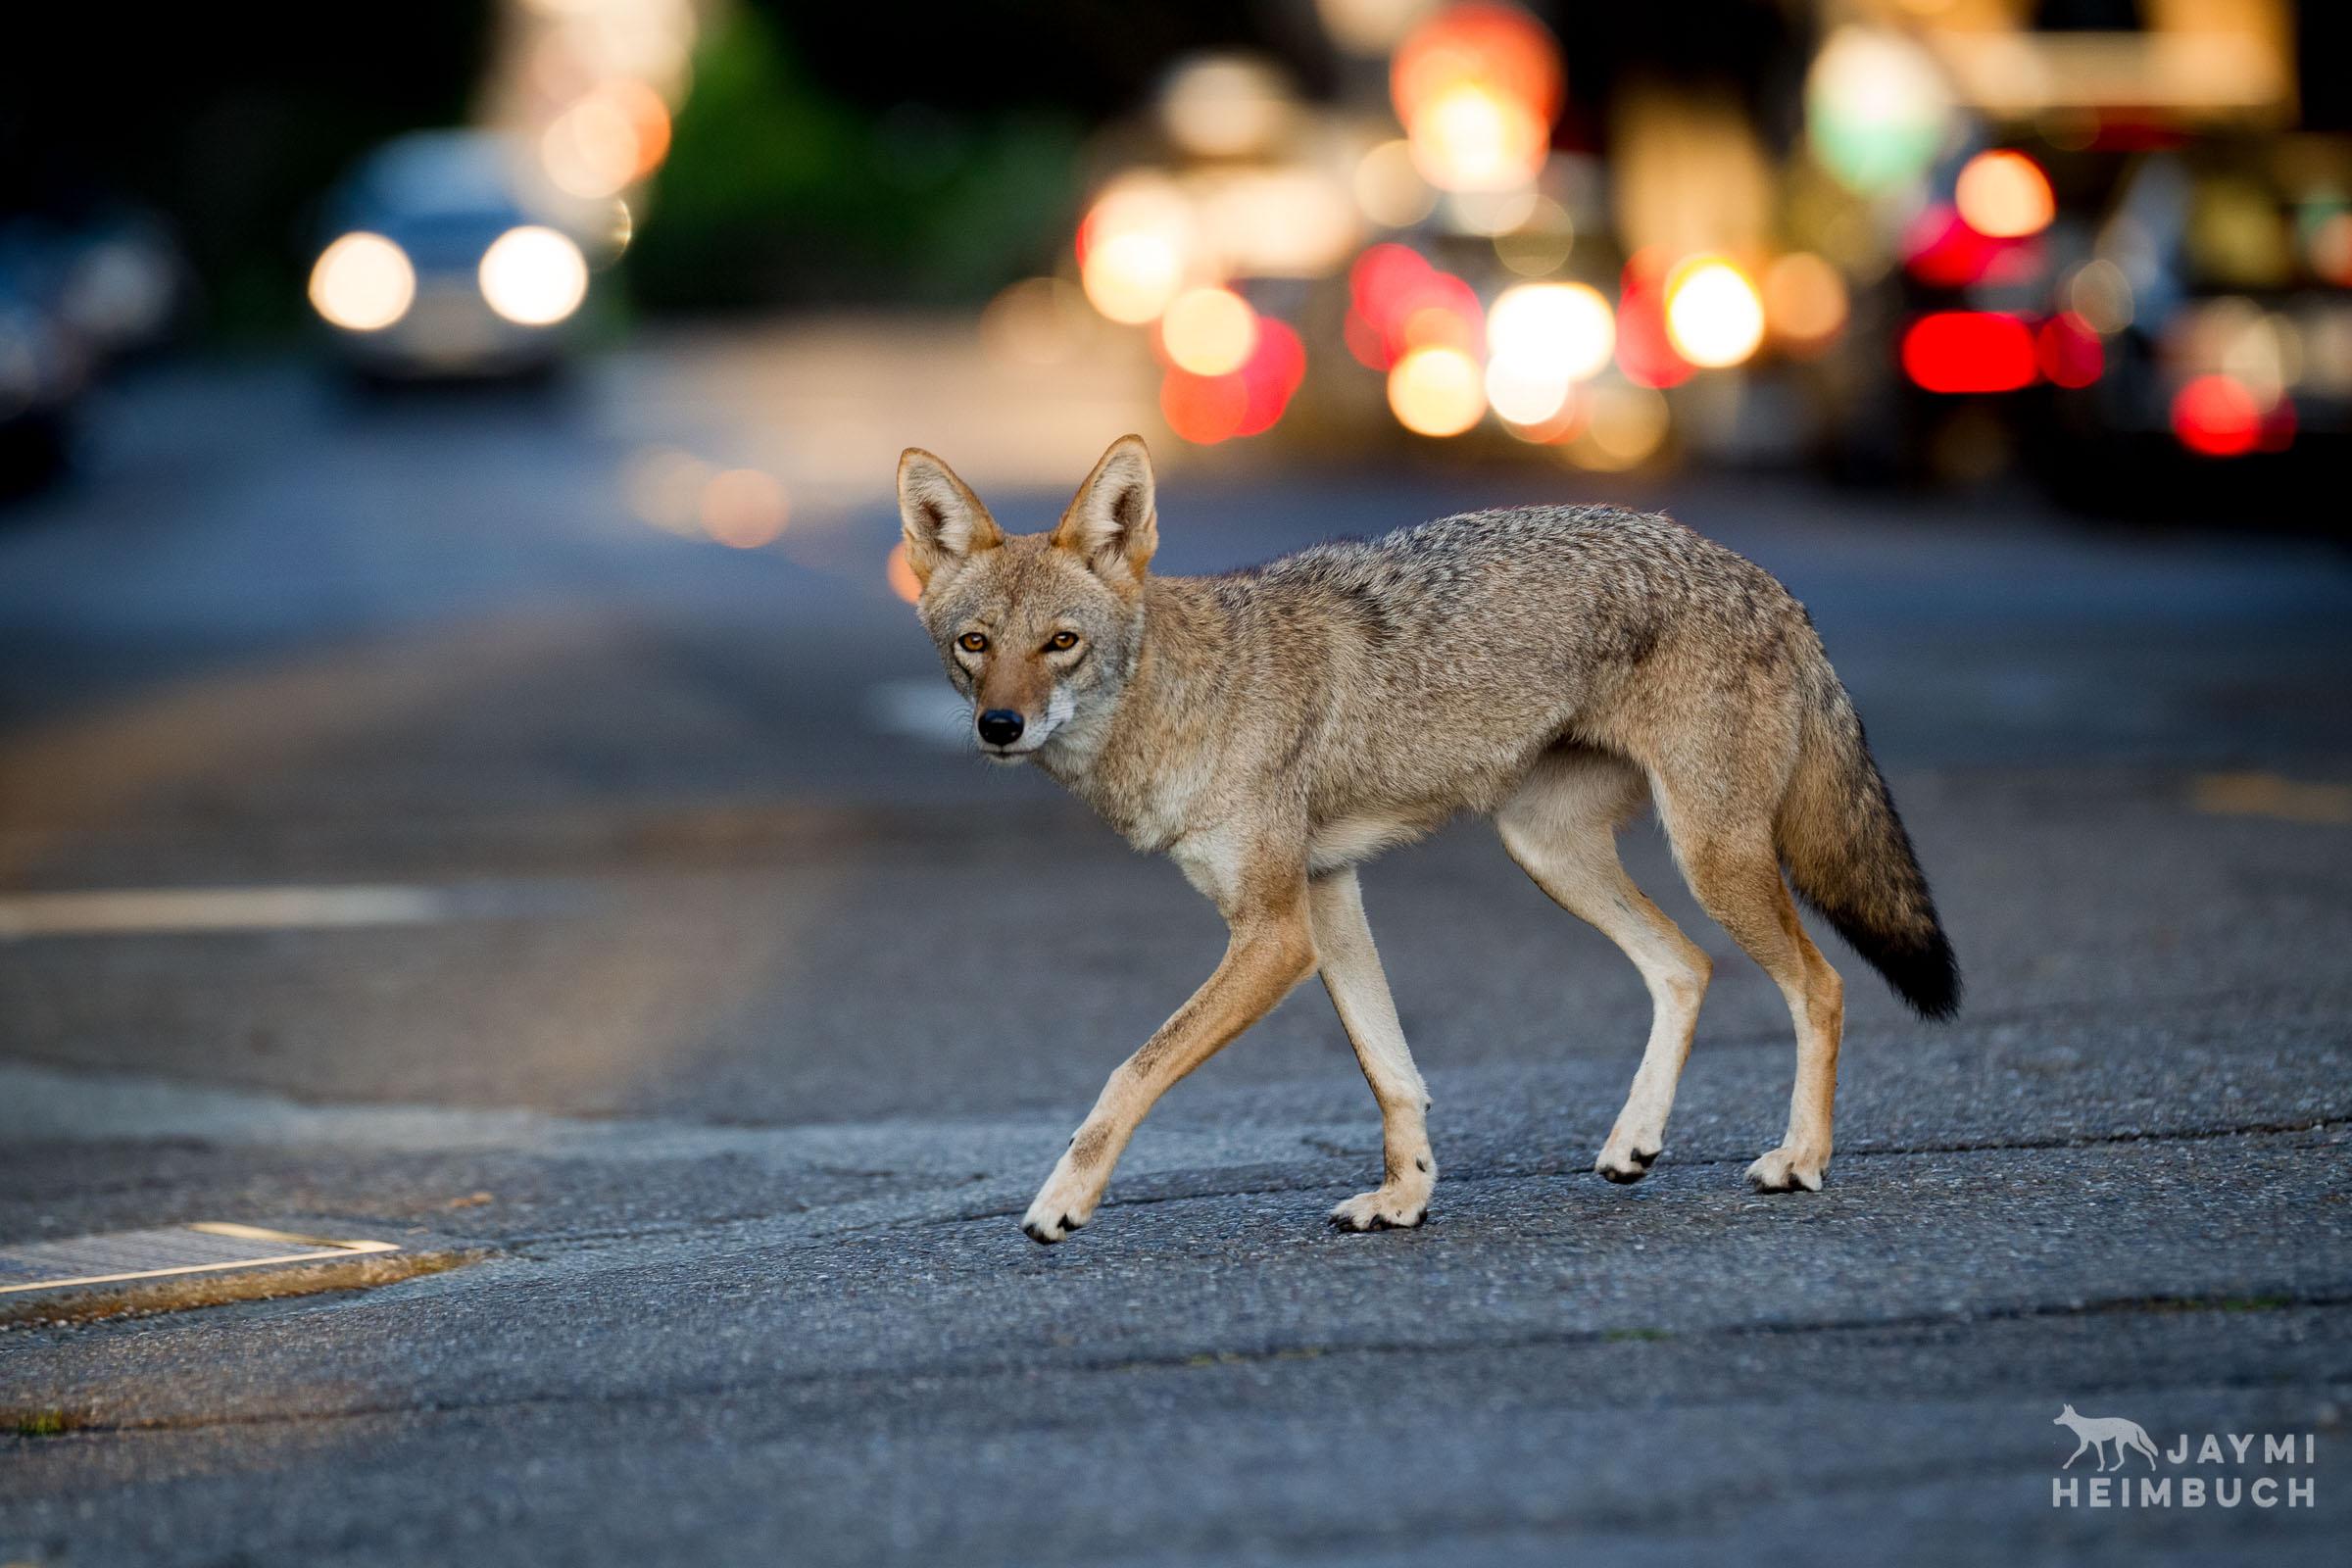 Urban coyote on city street, san francisco, california